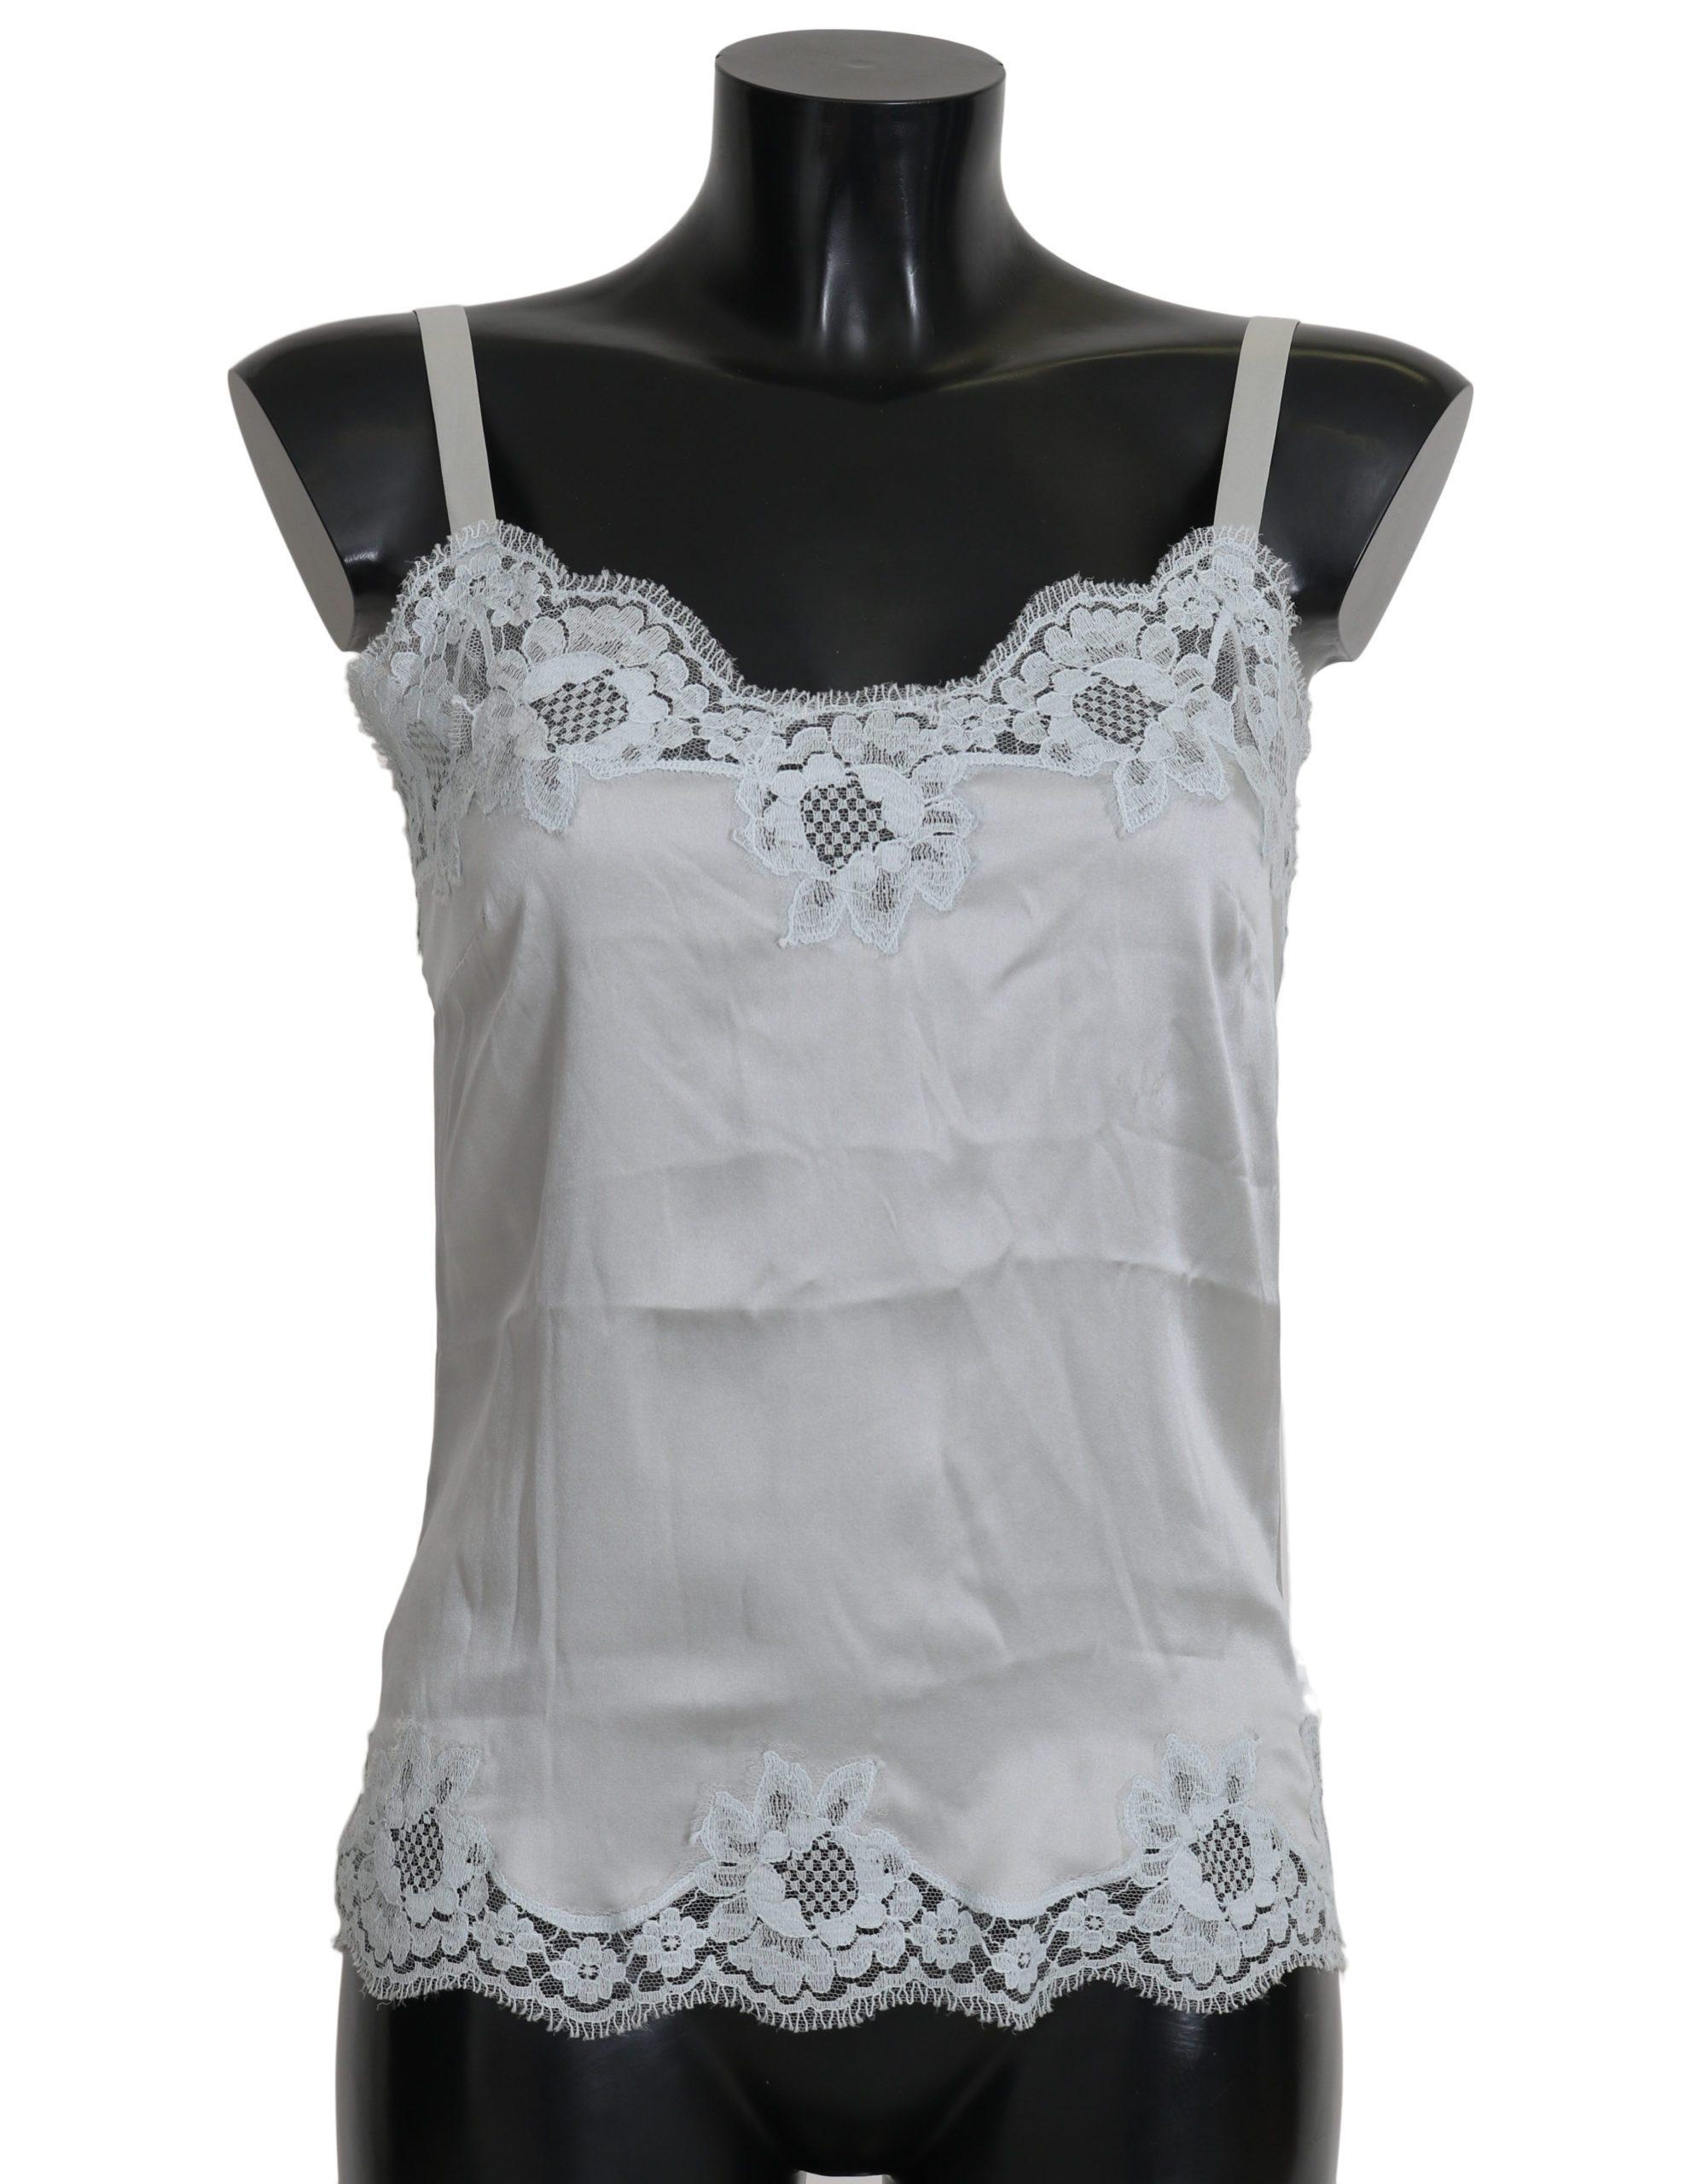 Dolce & Gabbana Women's Silk Lace Dress Lingerie White BIK246 - IT | XS